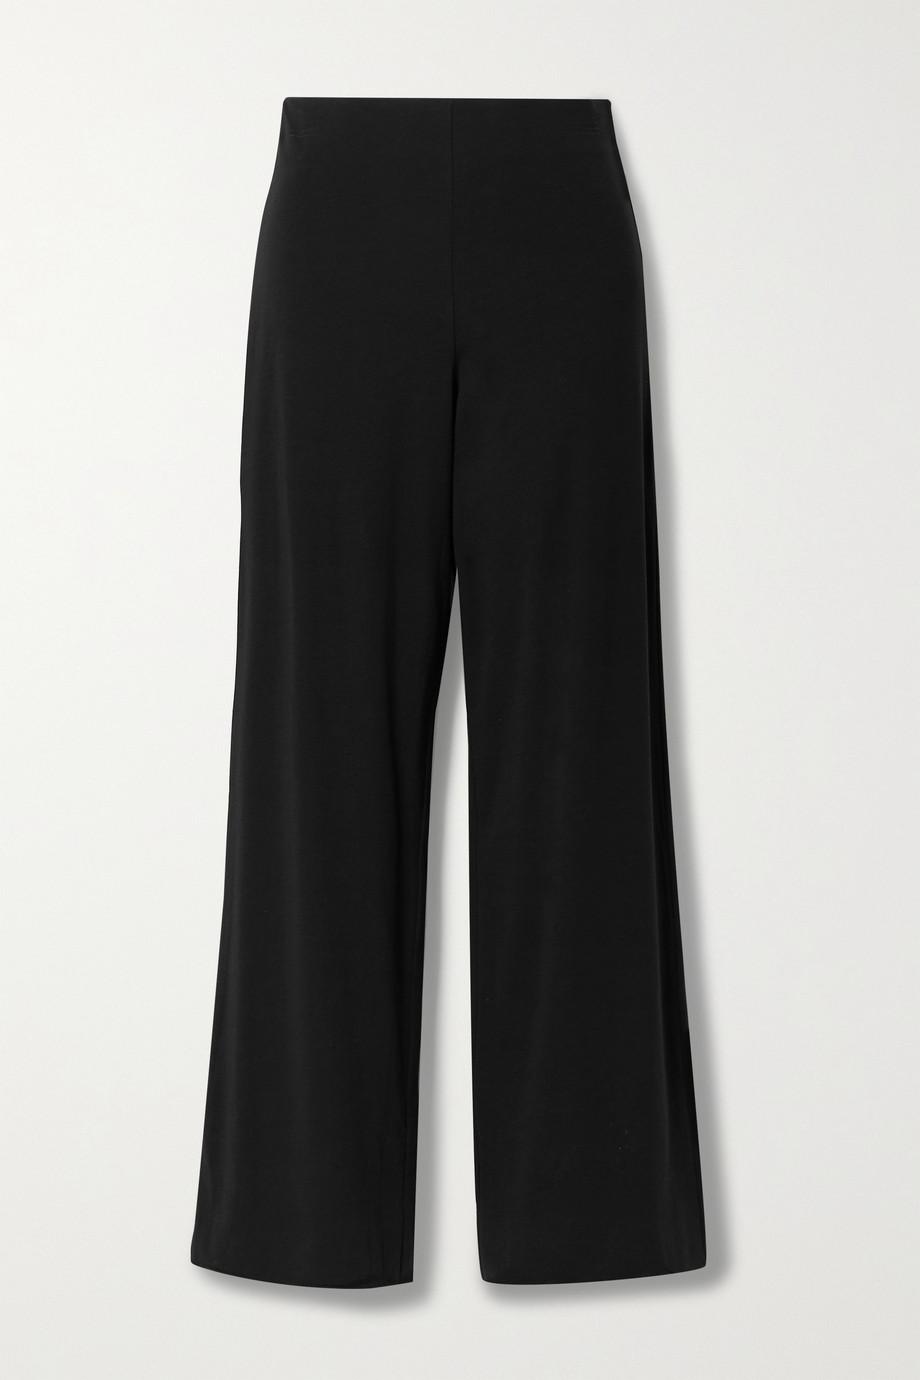 Skin Pantalon de pyjama en jersey de coton Pima biologique mélangé Athena - NET SUSTAIN